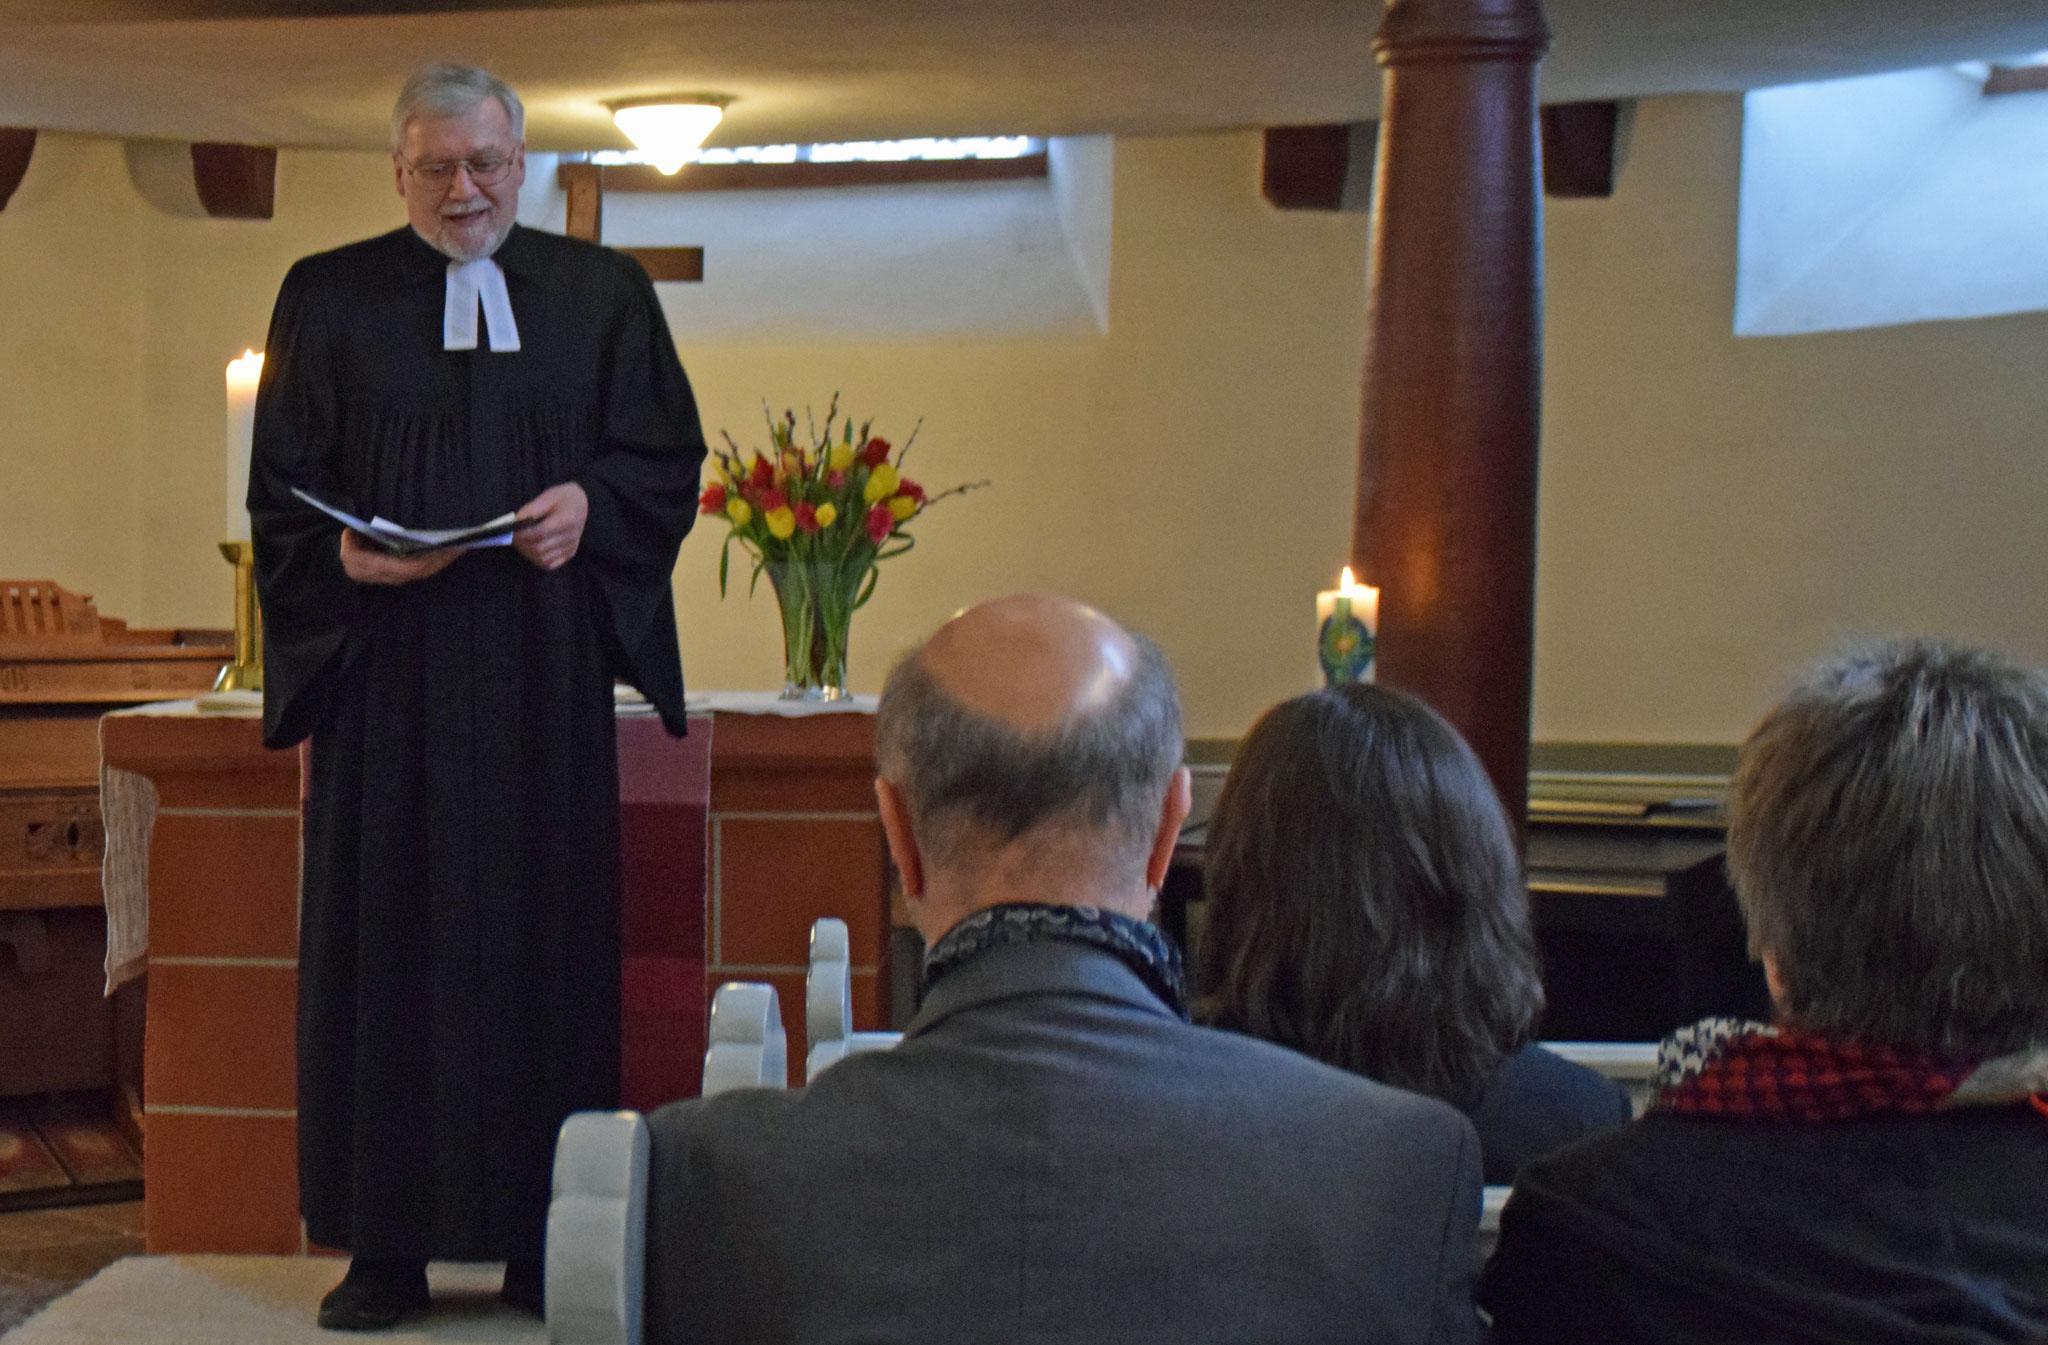 Ausbildungsleiter Wolfgang Keller bei seiner Ansprache. Foto: Gert Holle